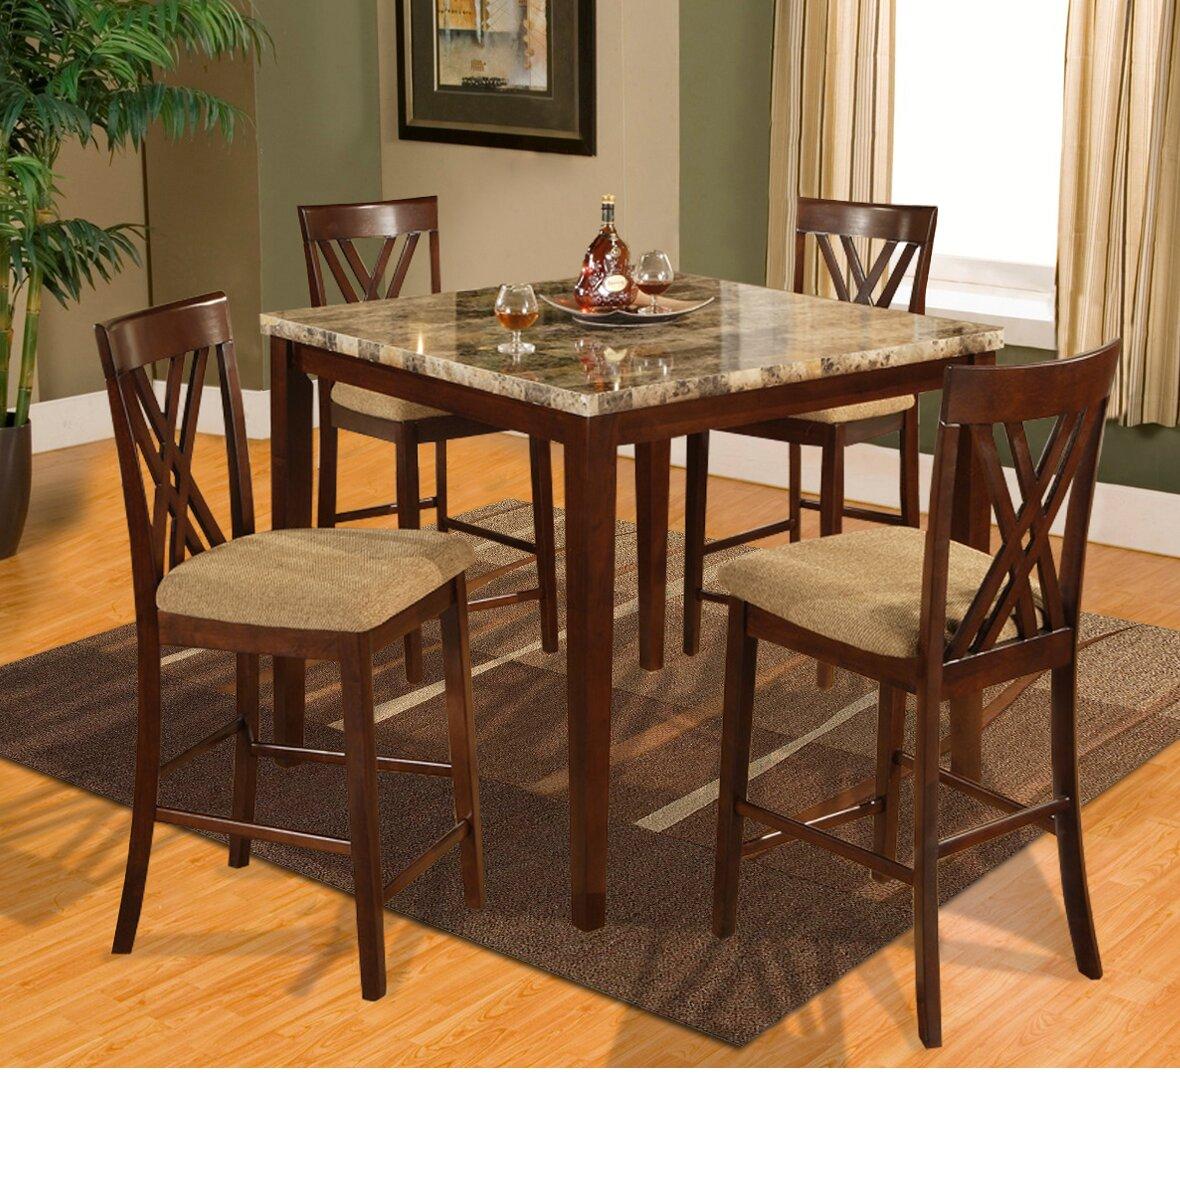 Dinettes Sets: Hazelwood Home Counter Height 5 Piece Dinette Set